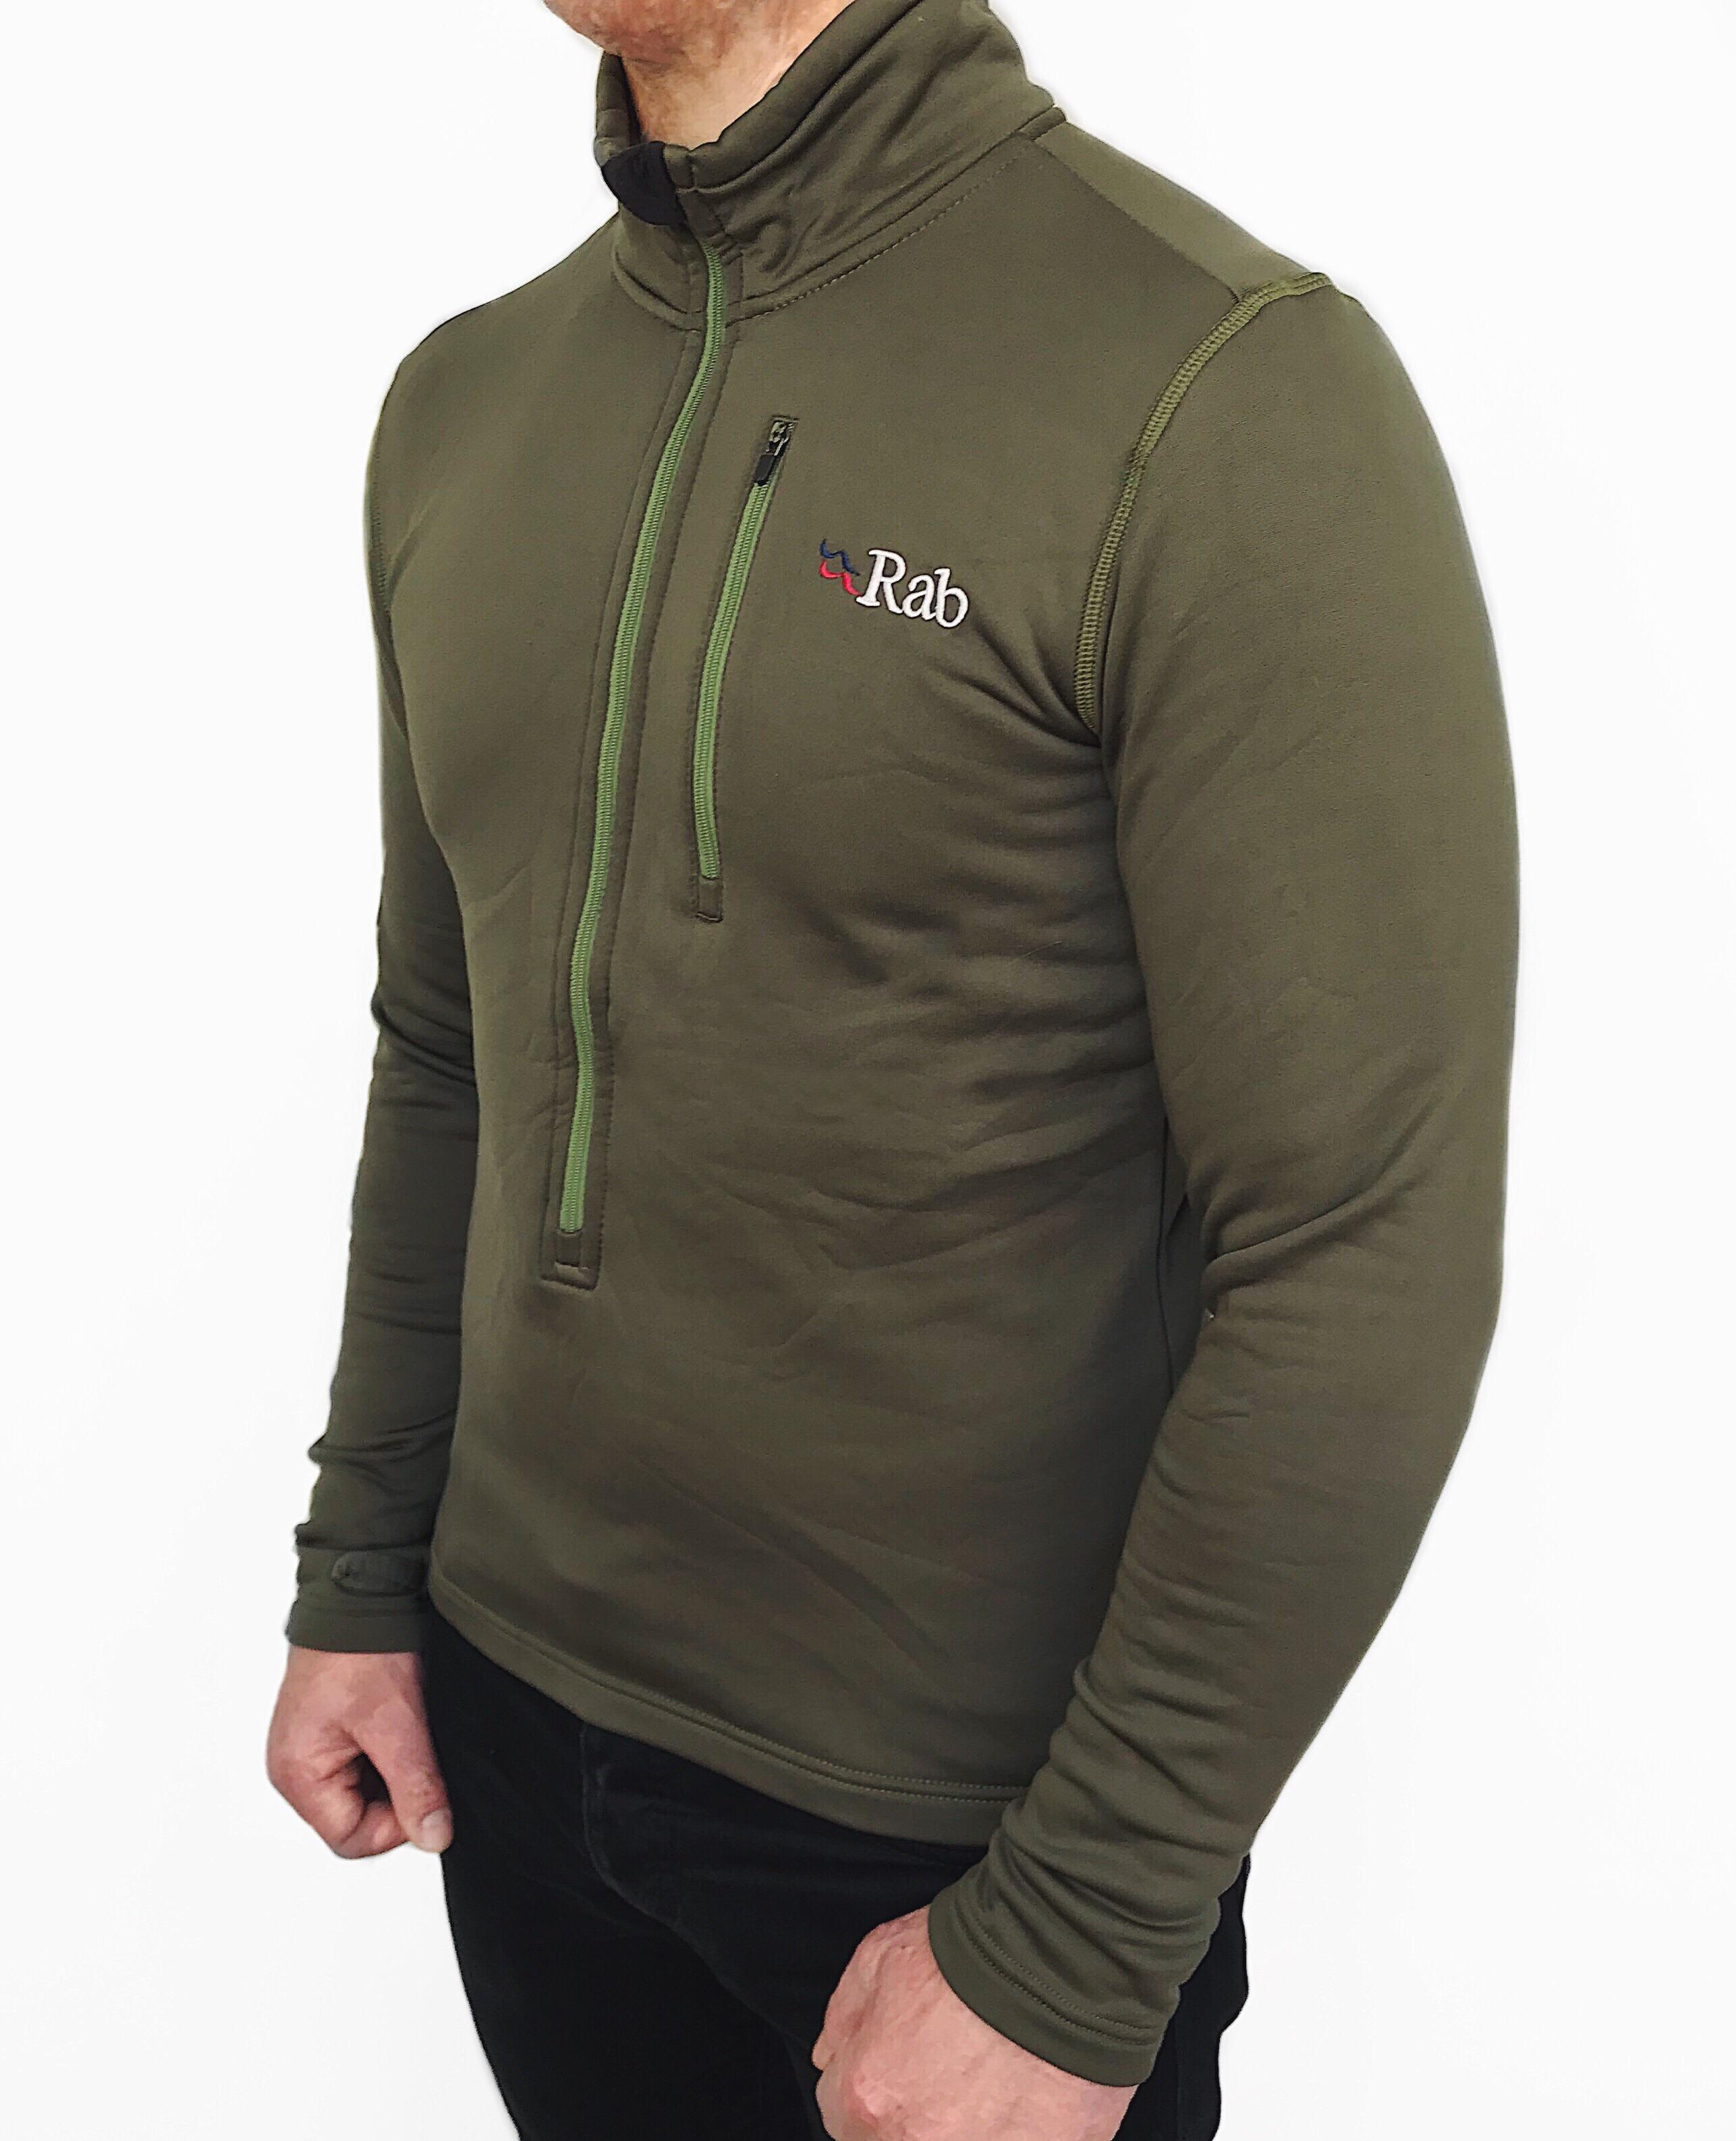 a541b824715026 Rab Rab Men's Power Stretch Zip Top Camo   Grailed